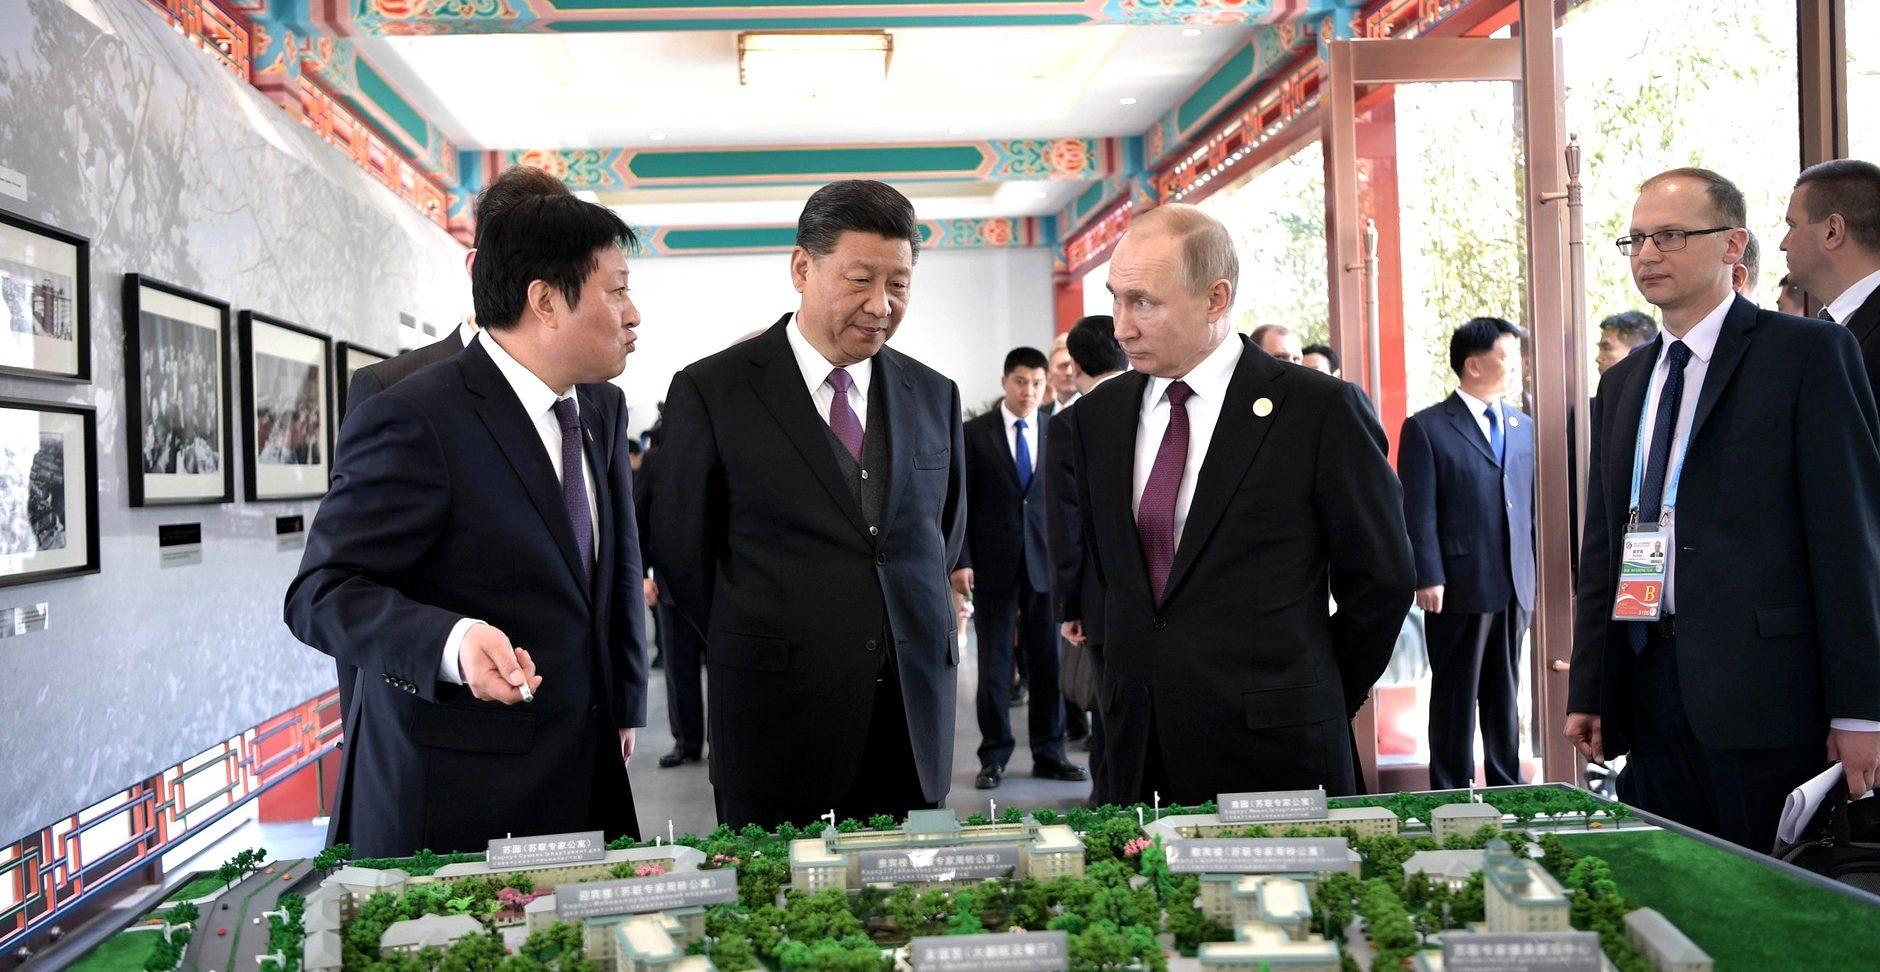 Xi Jinping meeting Vladimir Putin